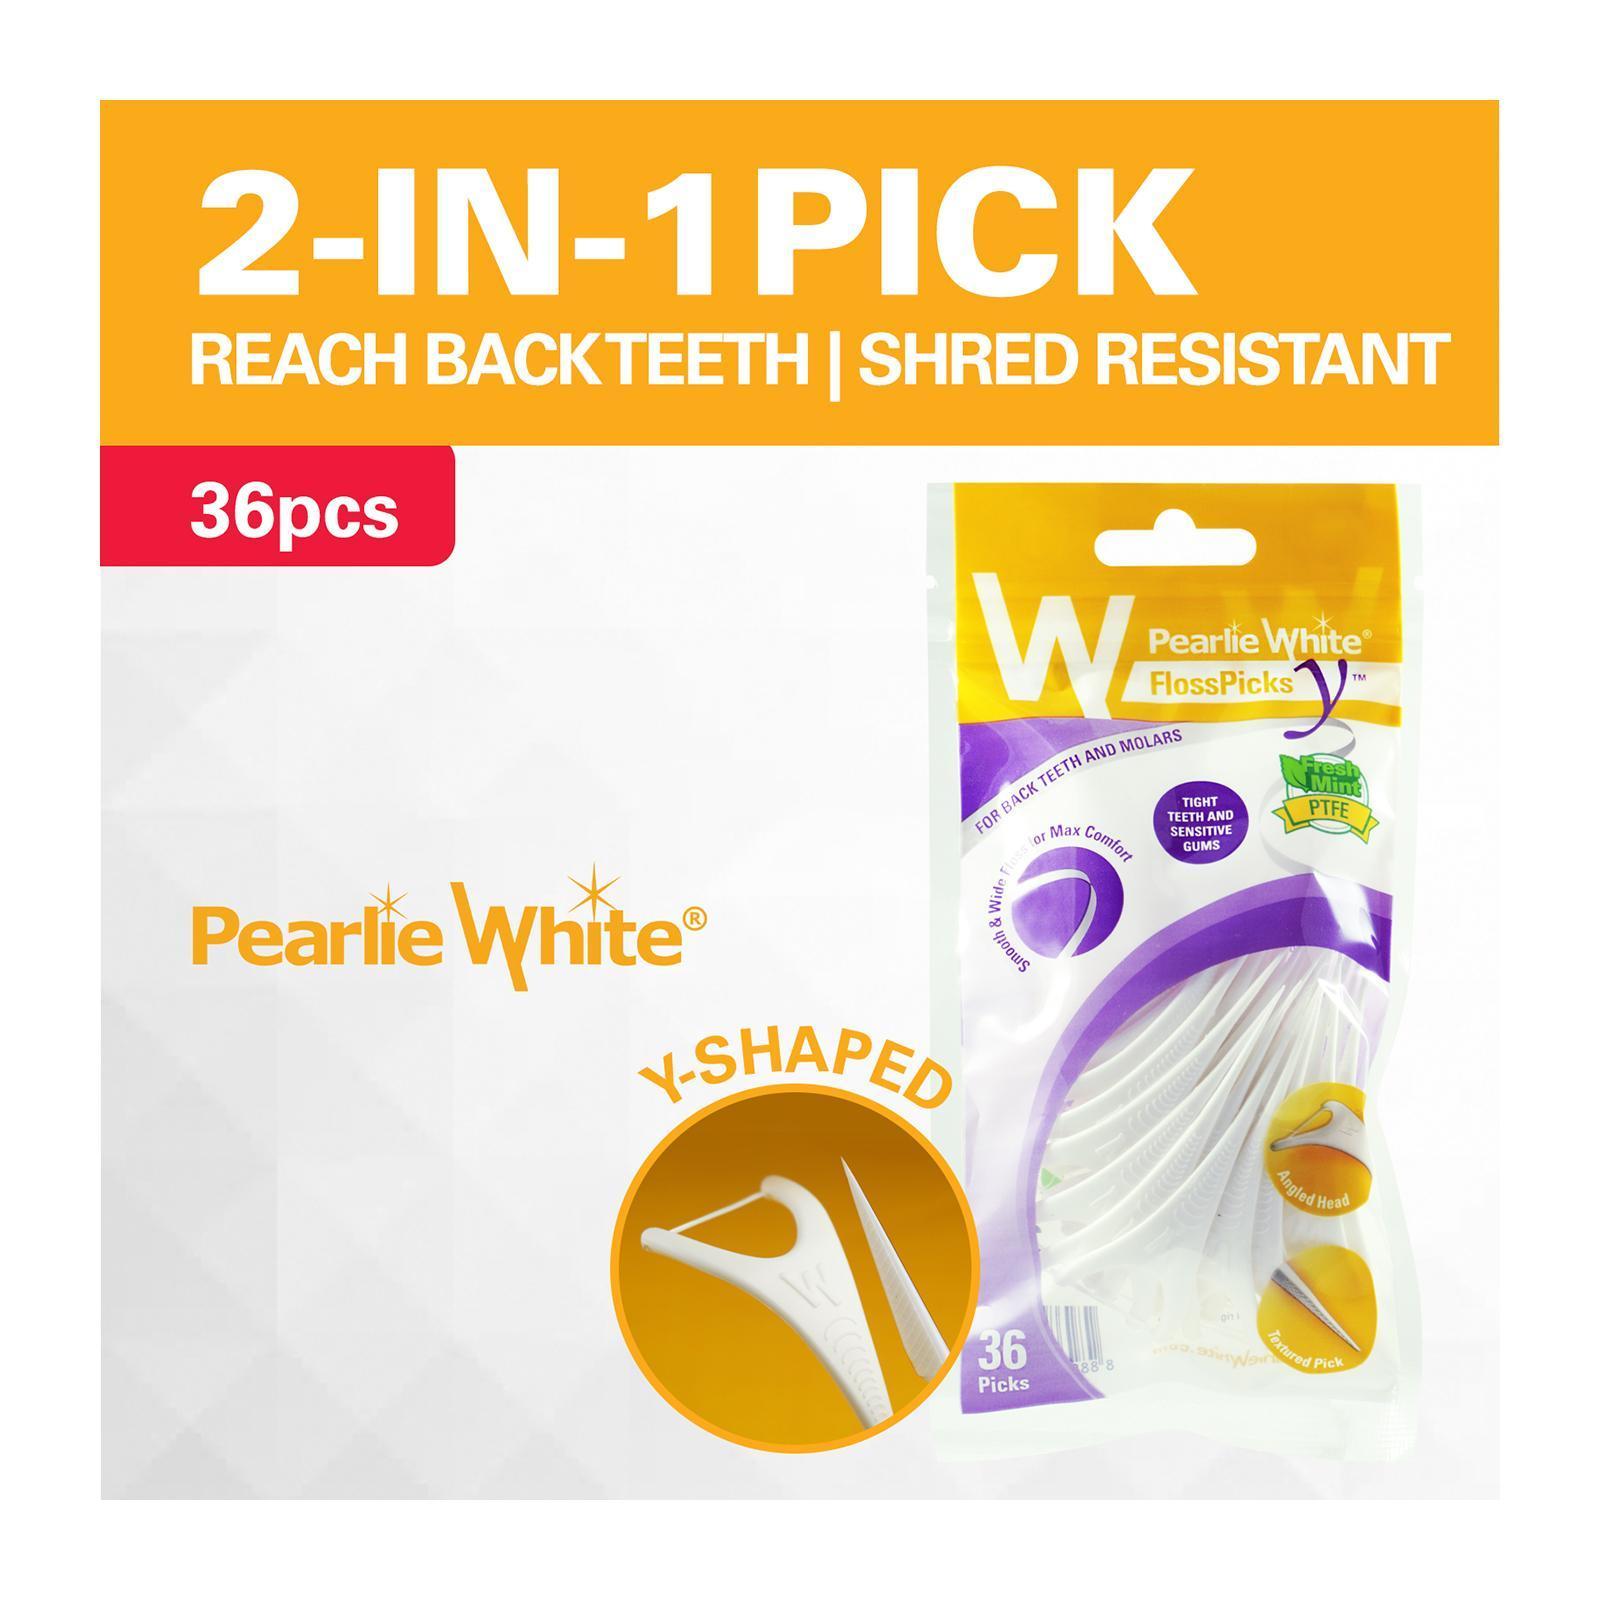 Pearlie White Floss Pick Y 2-IN-1 PTFE MINT Back Teeth Flosser